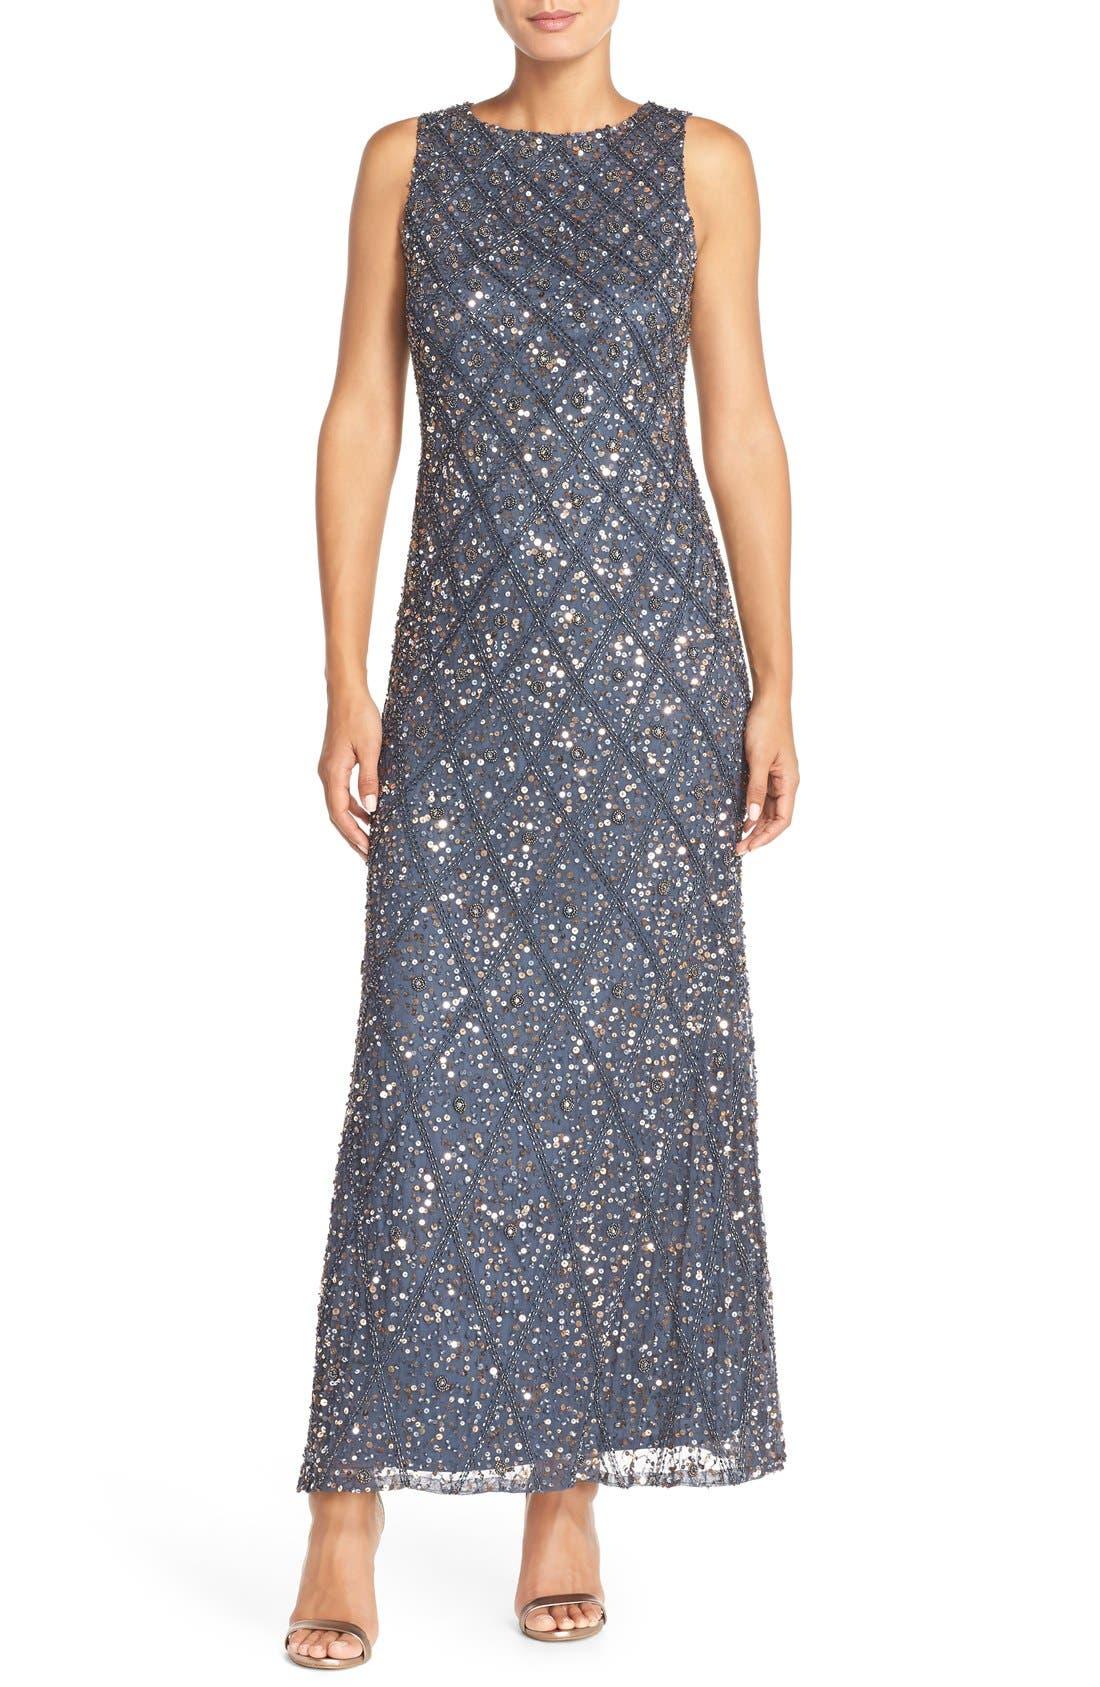 Main Image - Pisarro Nights Embellished Mesh Gown (Regular & Petite)